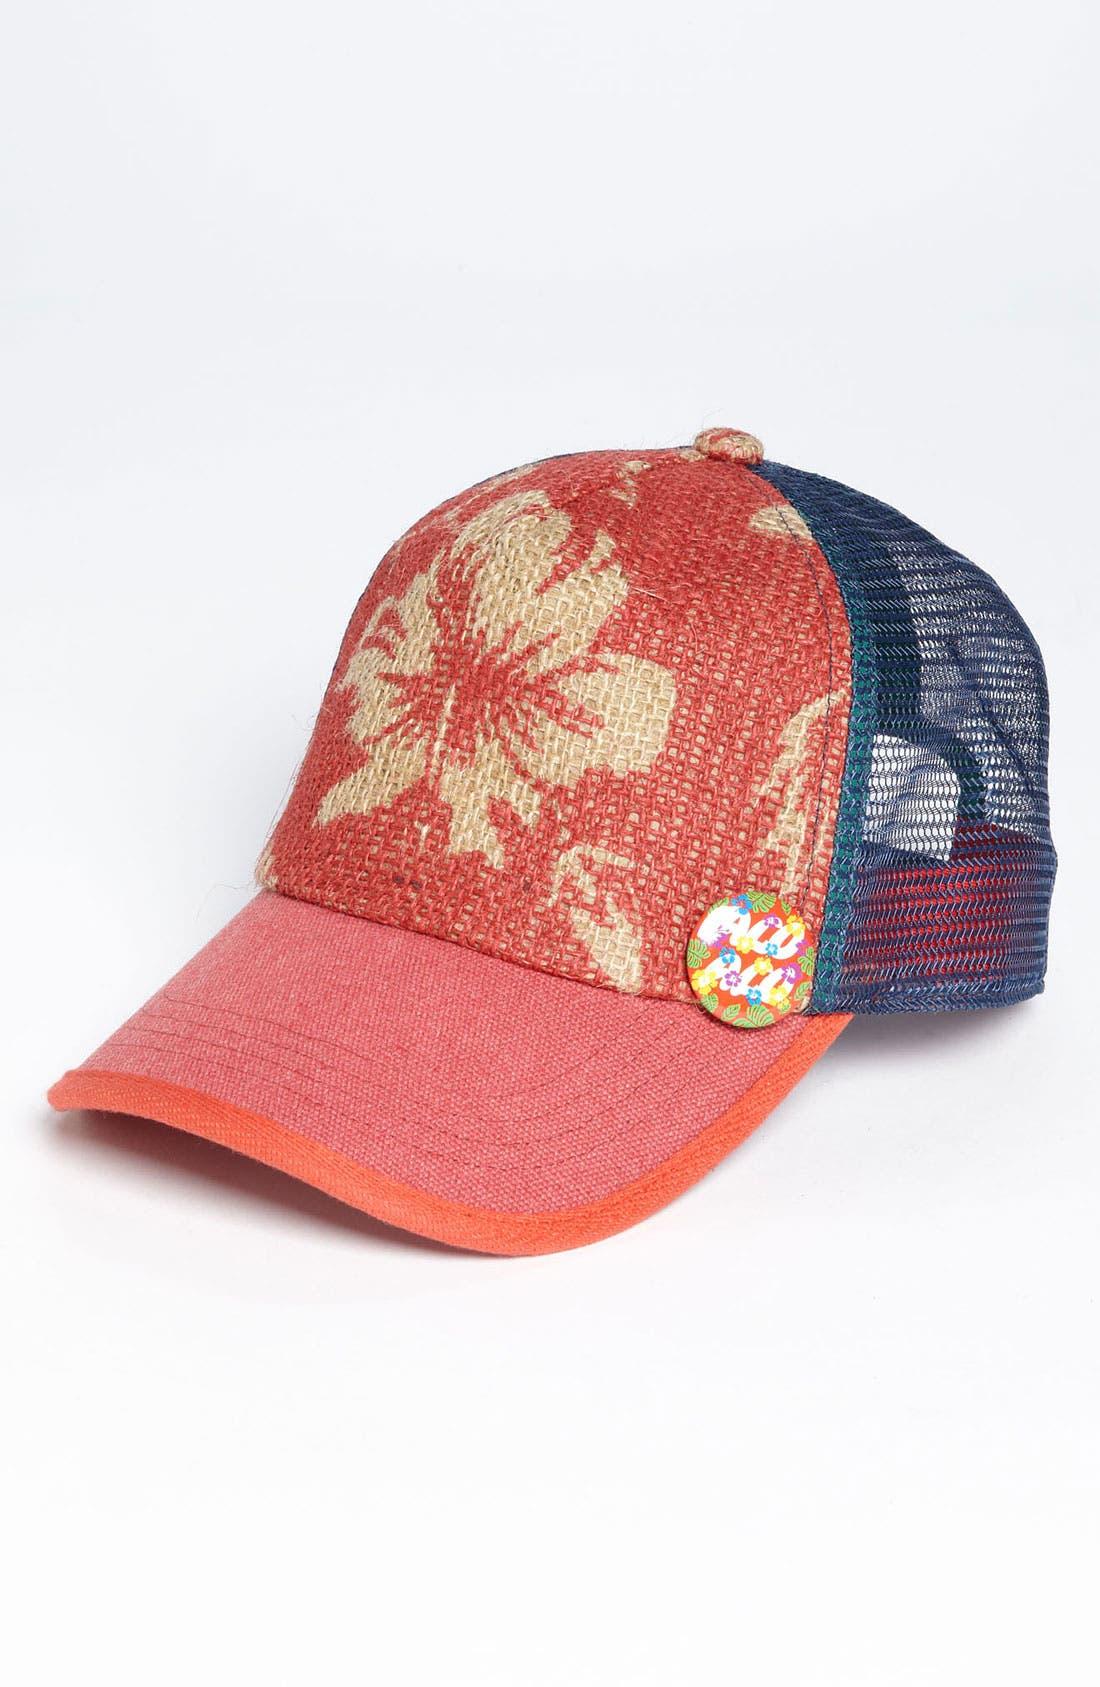 Alternate Image 1 Selected - Grace Hats 'Alo Alo' Cap